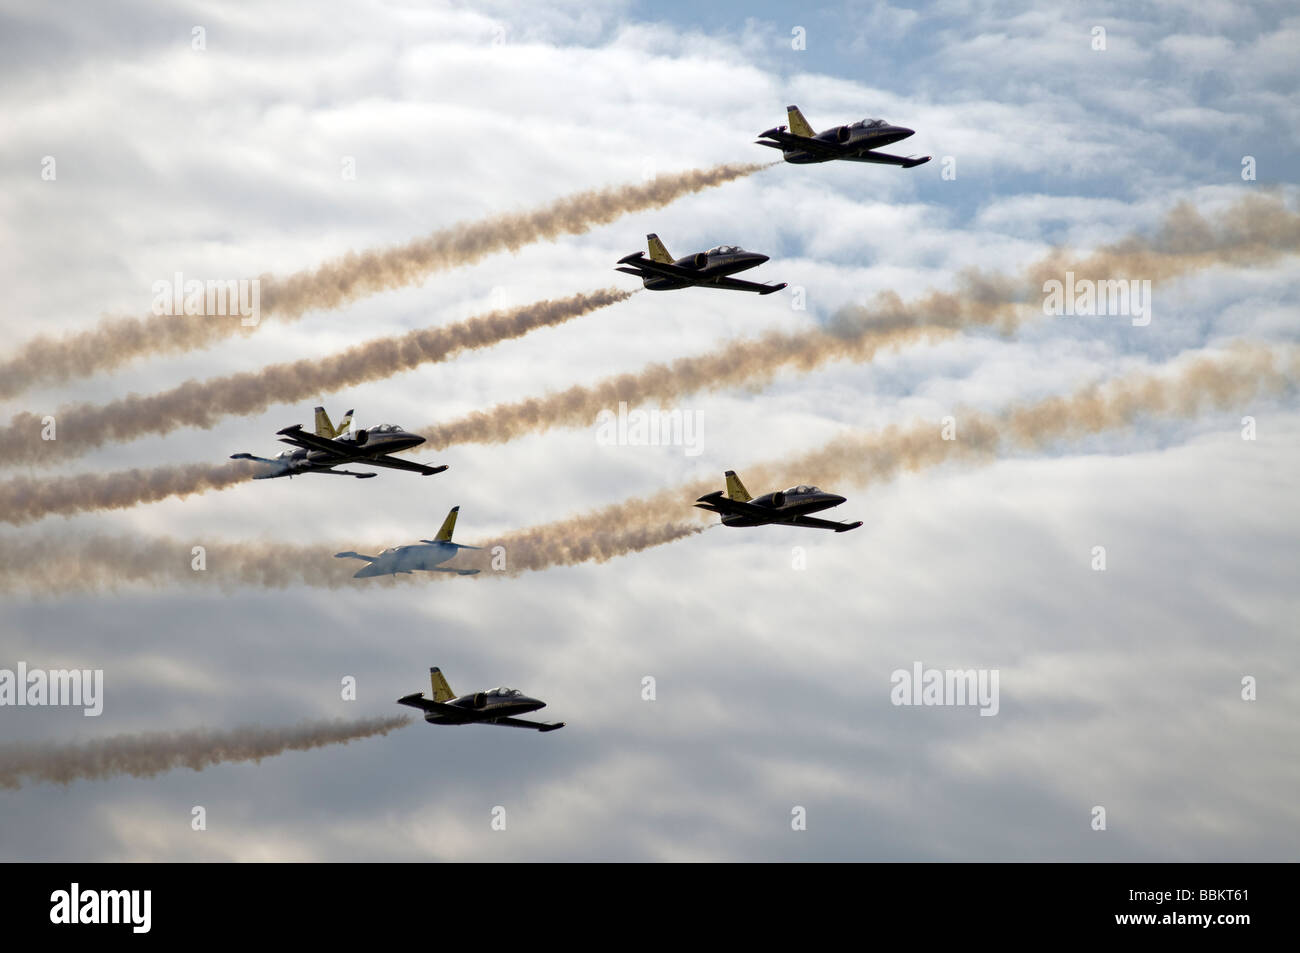 Ferte Alais Breitling Jet Team passing extremely close - Stock Image